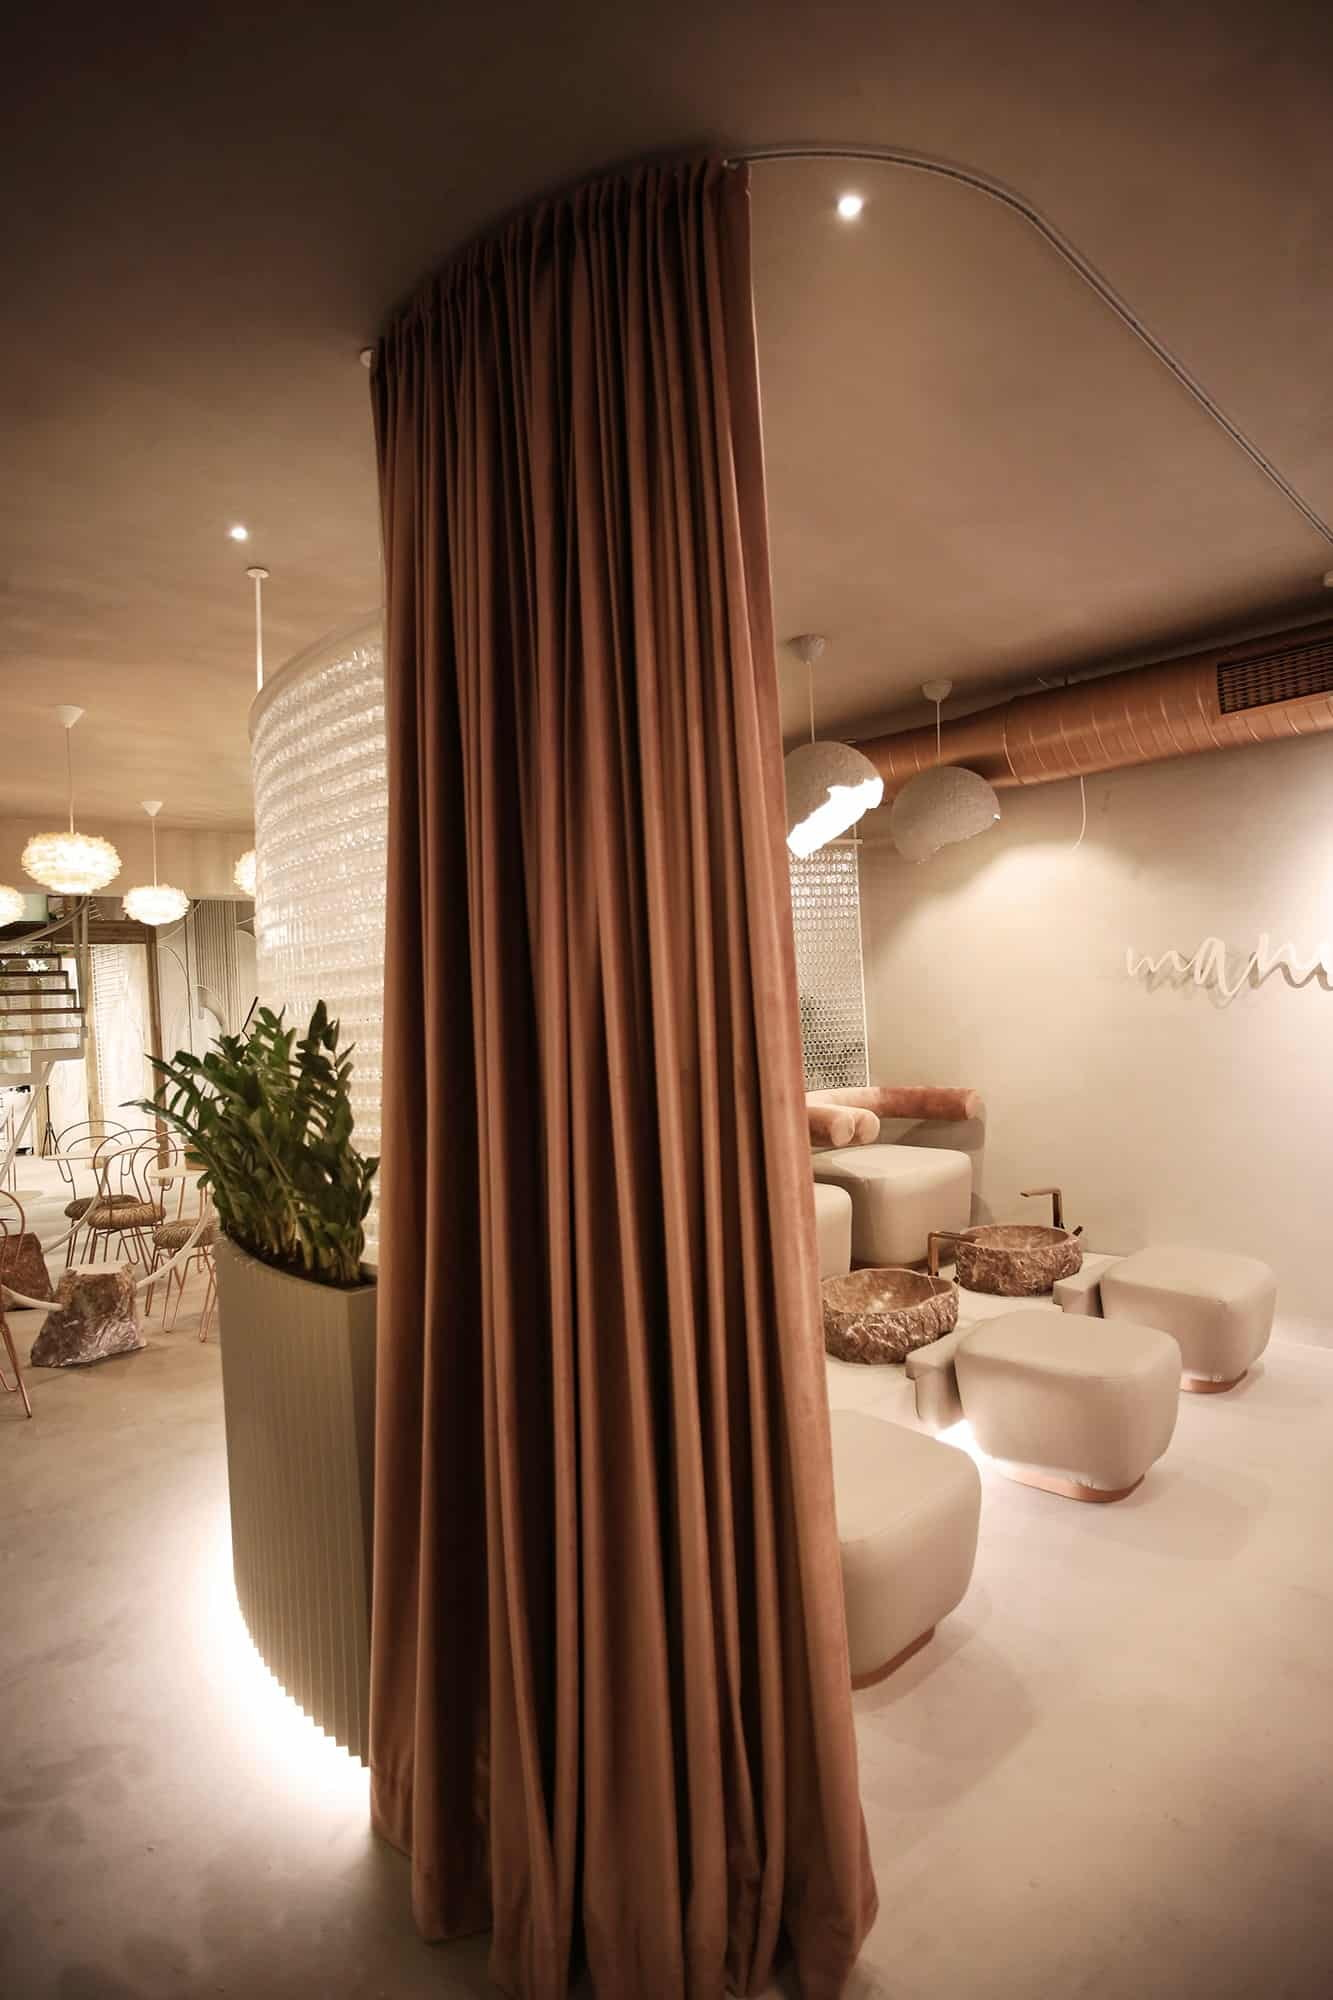 The minimalist pedicure area inside Kosovo's new Angel Salon